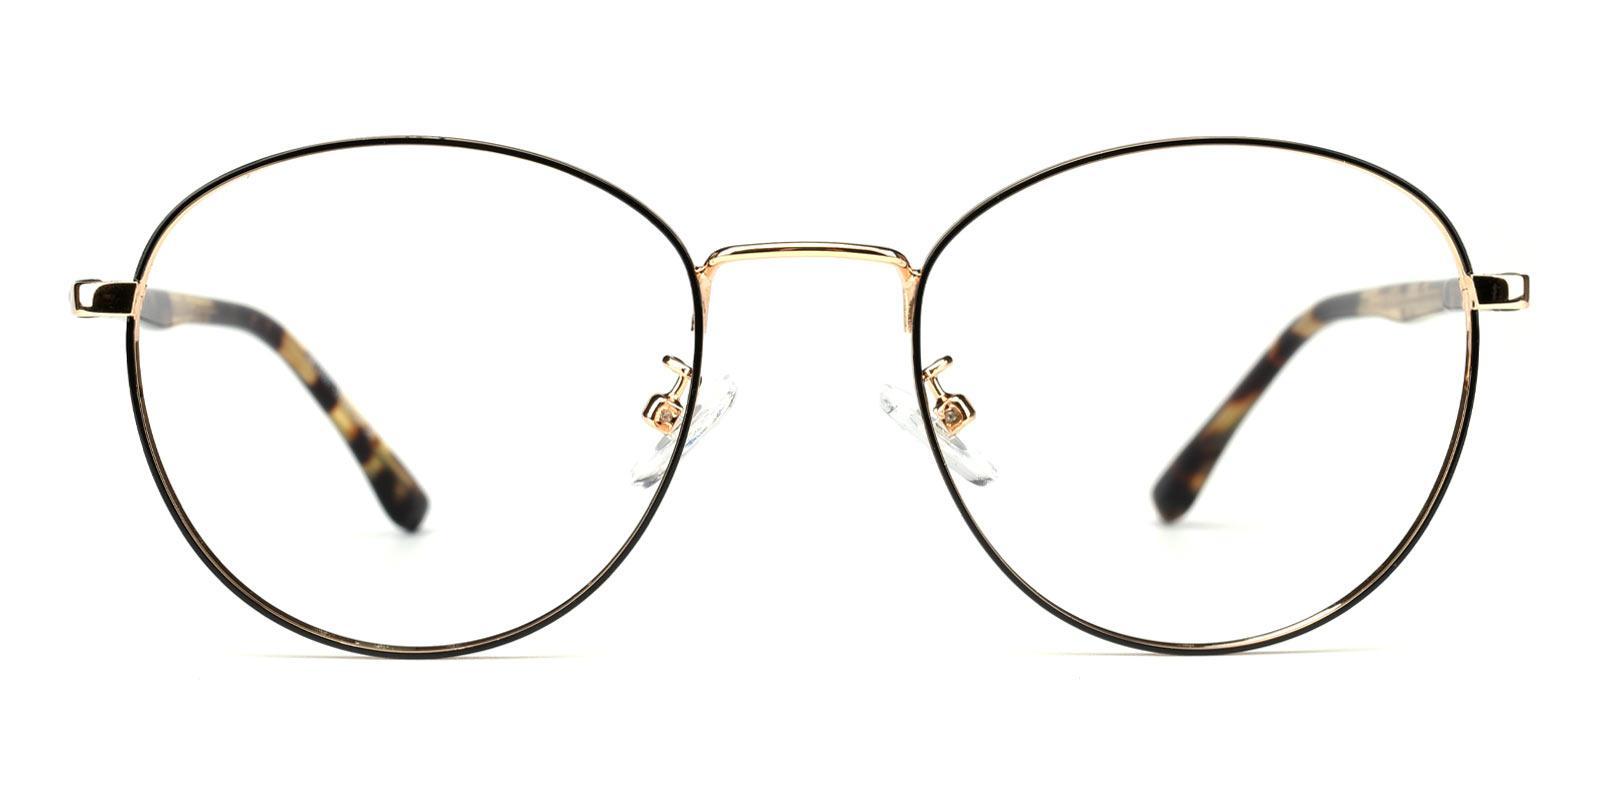 Gemma-Tortoise-Round-Metal-Eyeglasses-detail